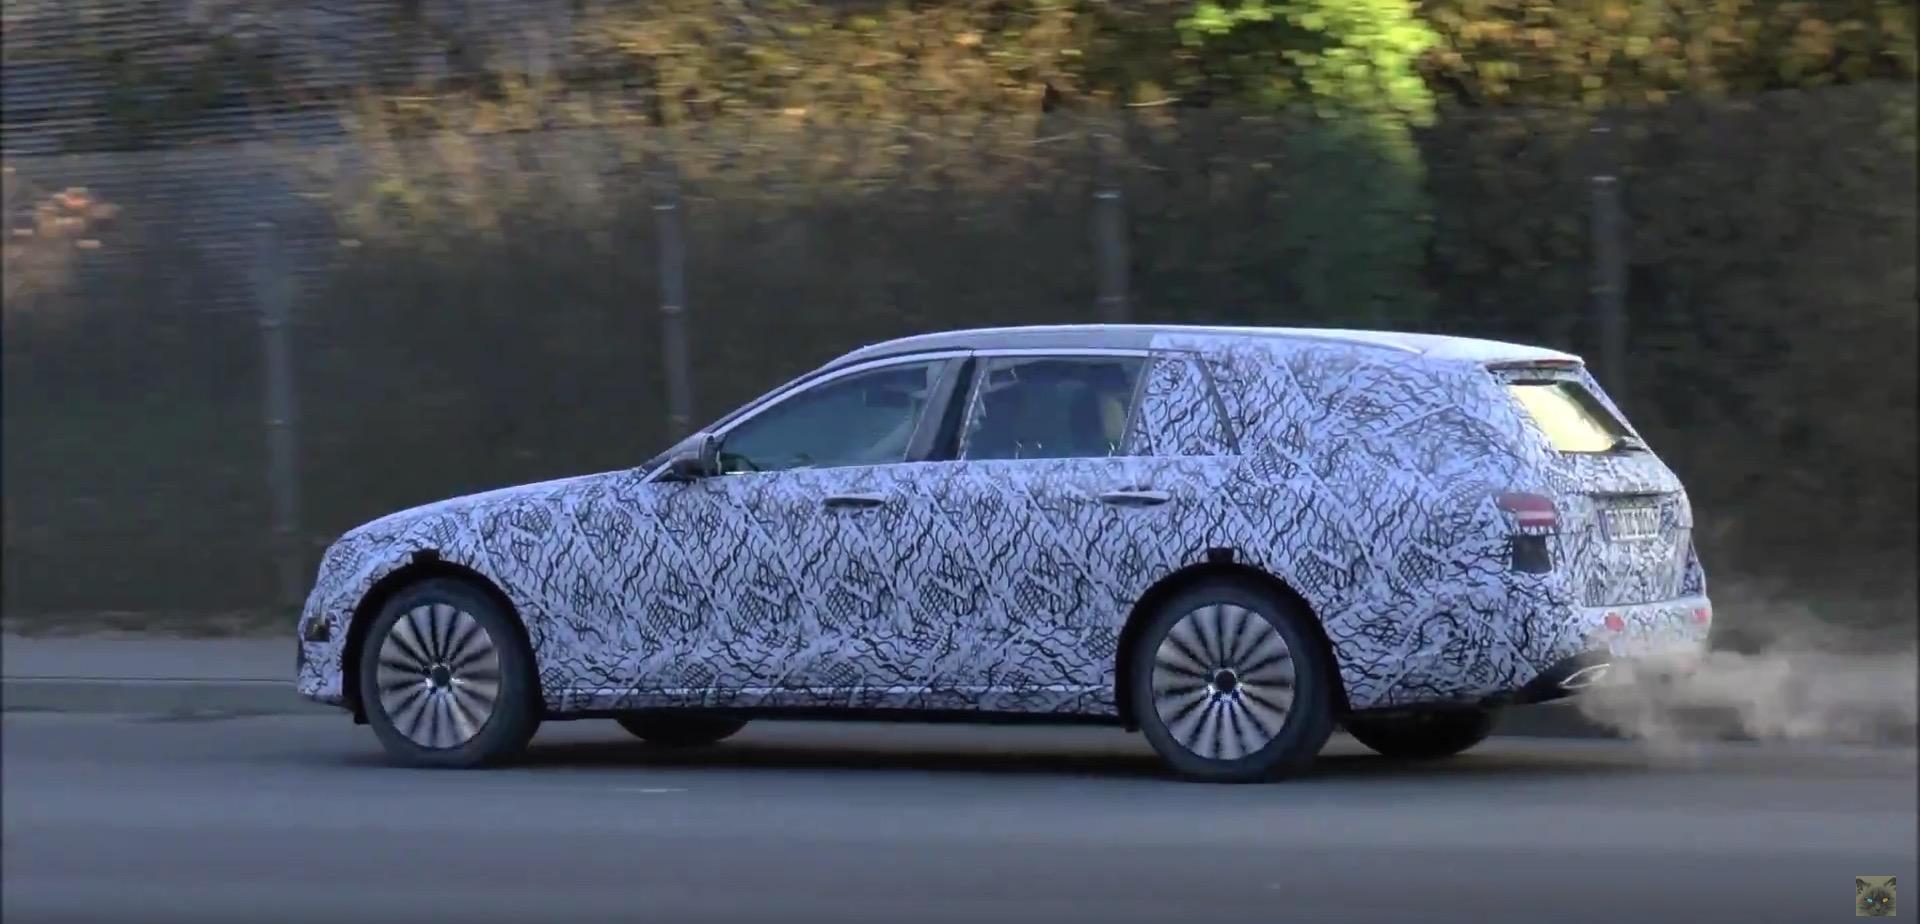 2017 mercedes benz e class t modell wagon makes latest for Mercedes benz m class 2017